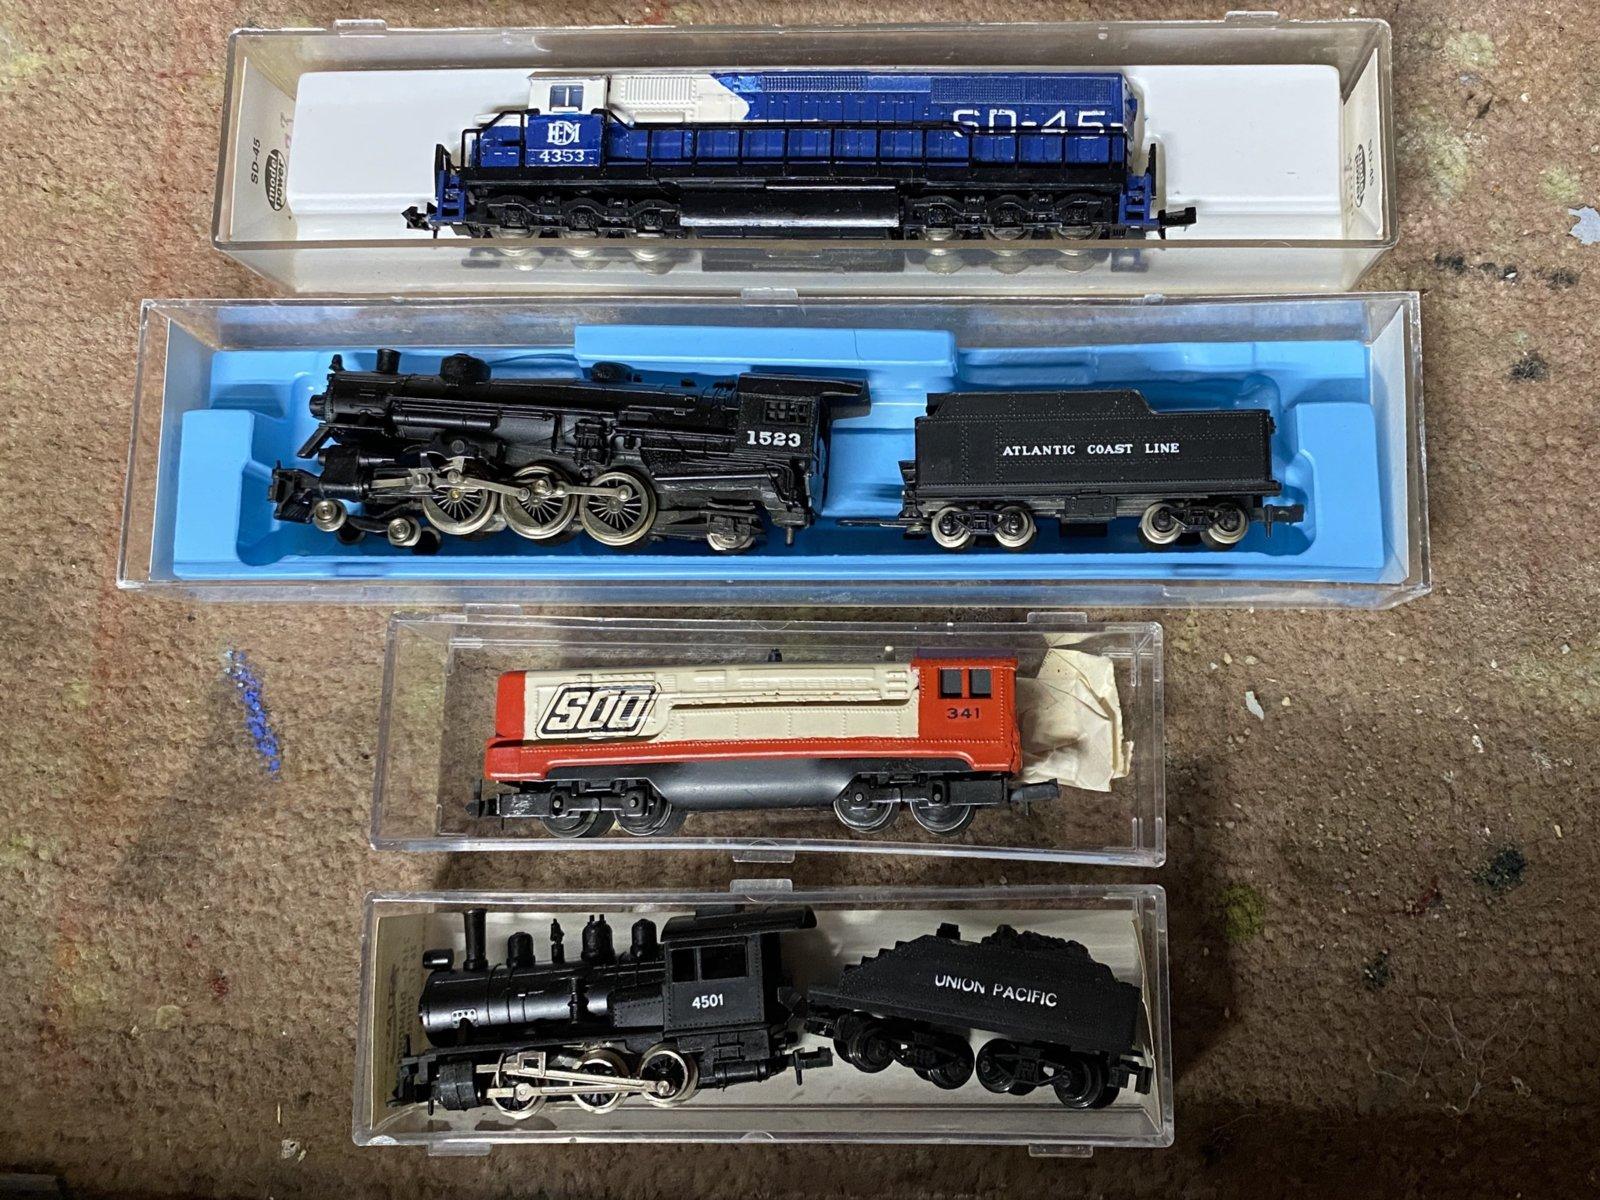 69BBF5F9-9961-4DCF-A397-311D54D81F5D.jpeg